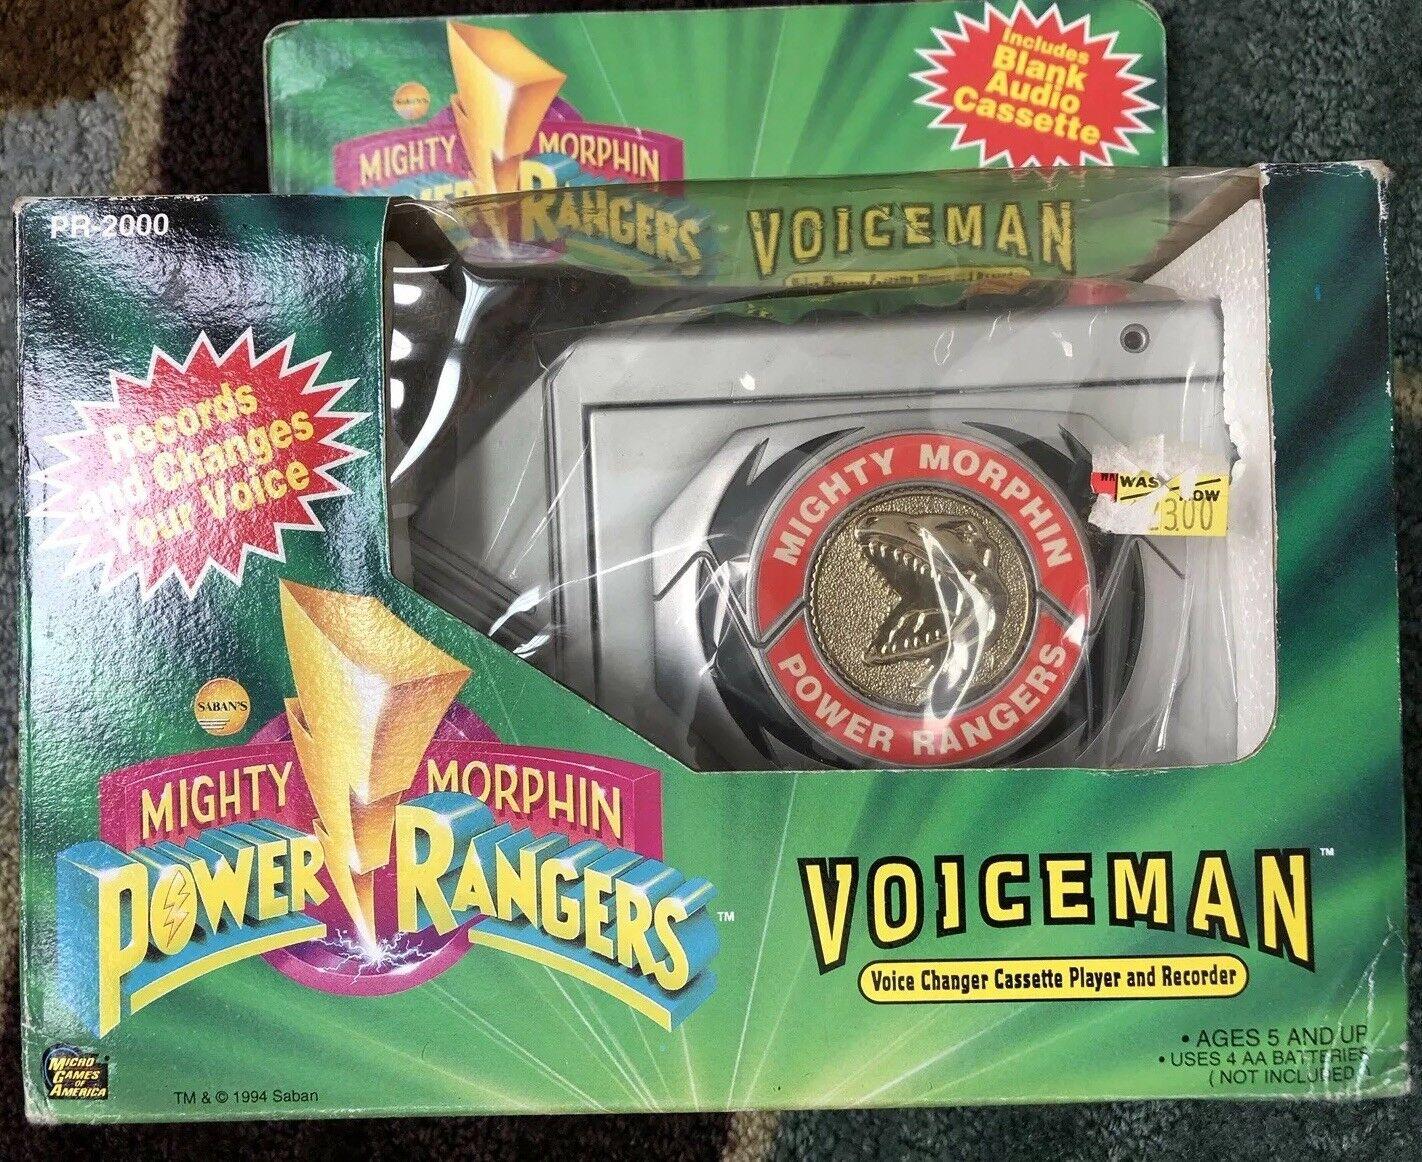 1994 morphin mächtig power rangers voiceman voice changer kassettenrekorder jahrgang